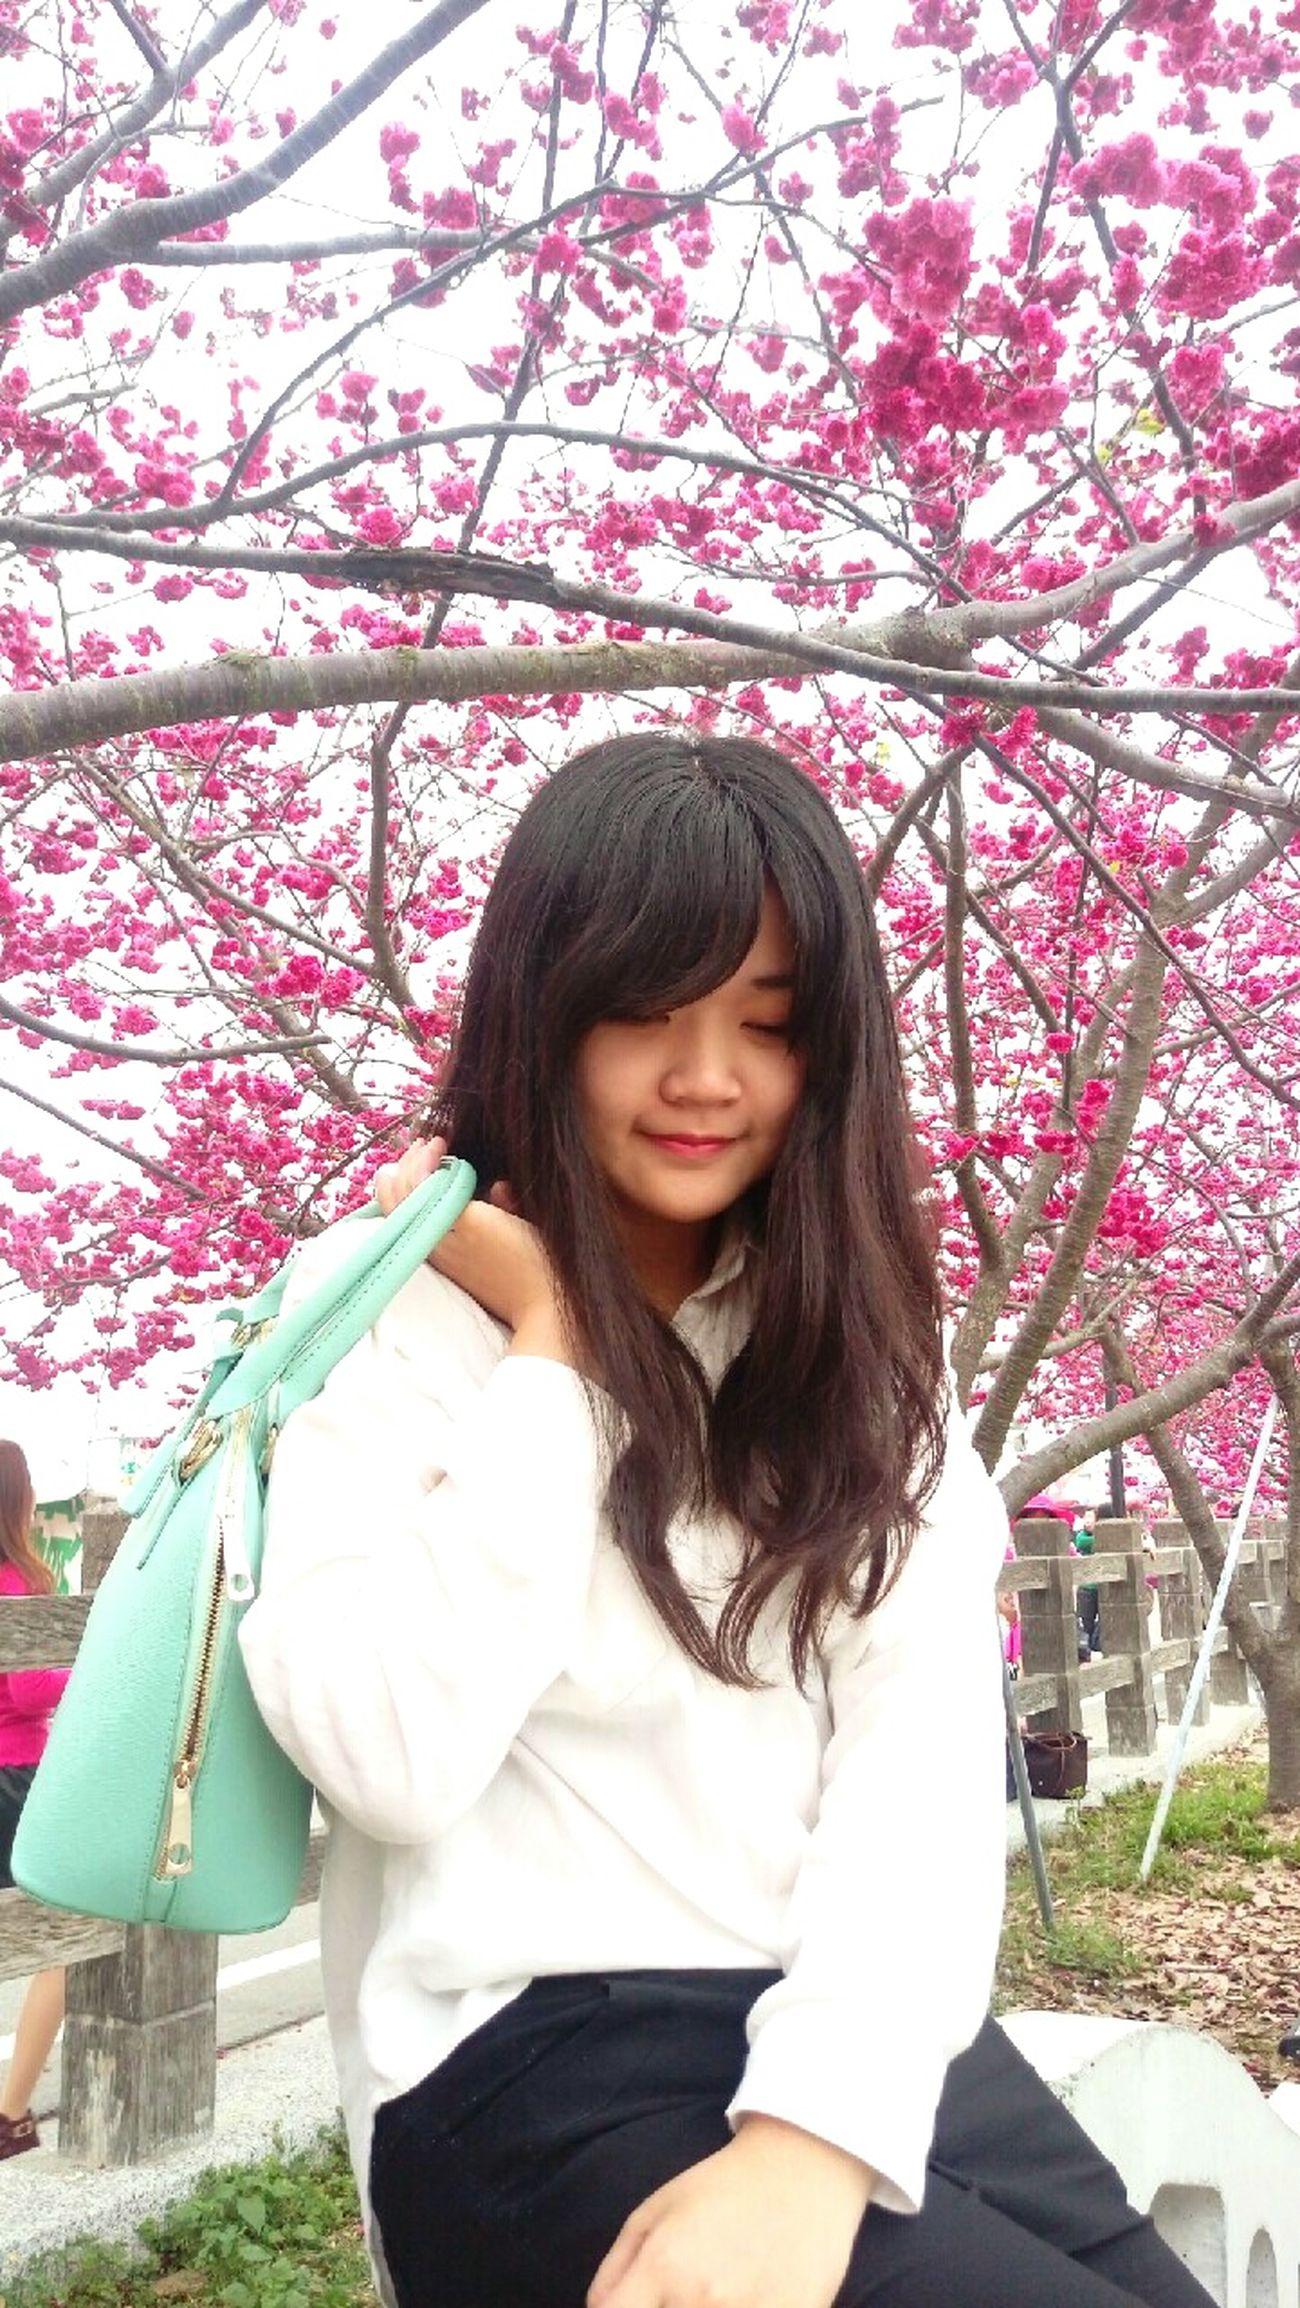 Sakura🌸桜🌸 First Eyeem Photo